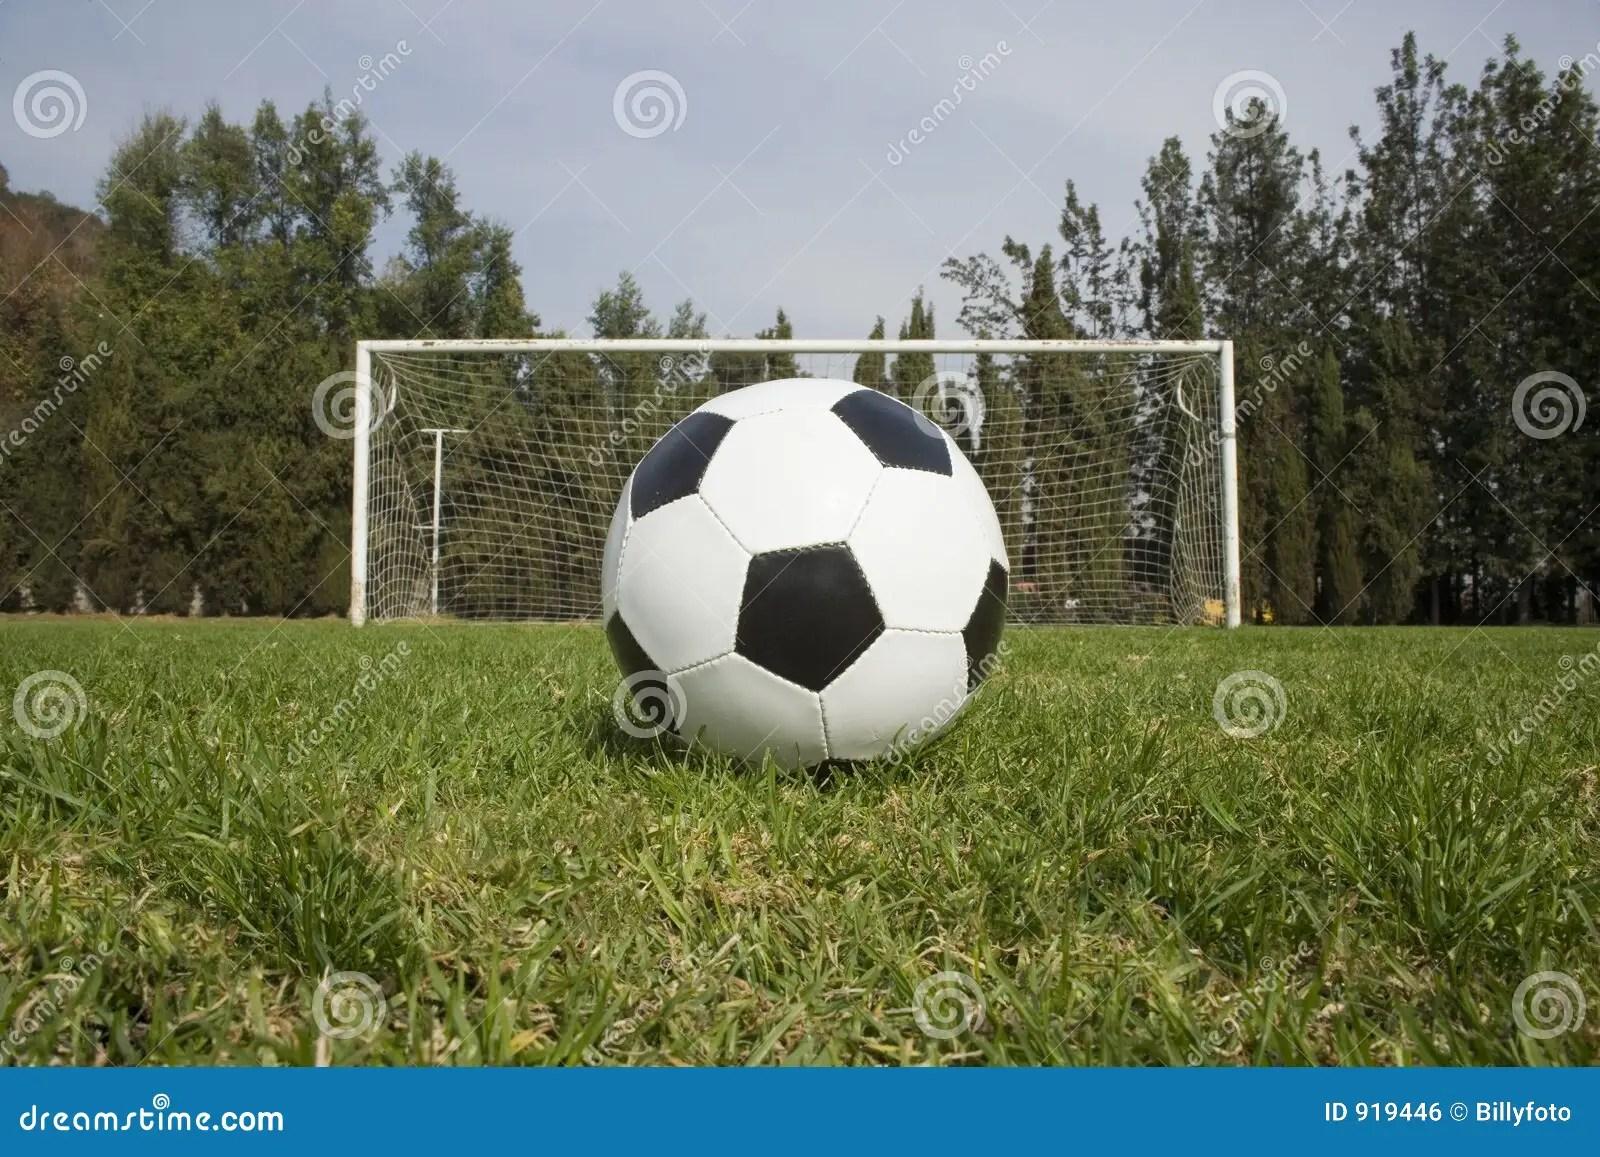 Soccerball2 Royalty Free Stock Image